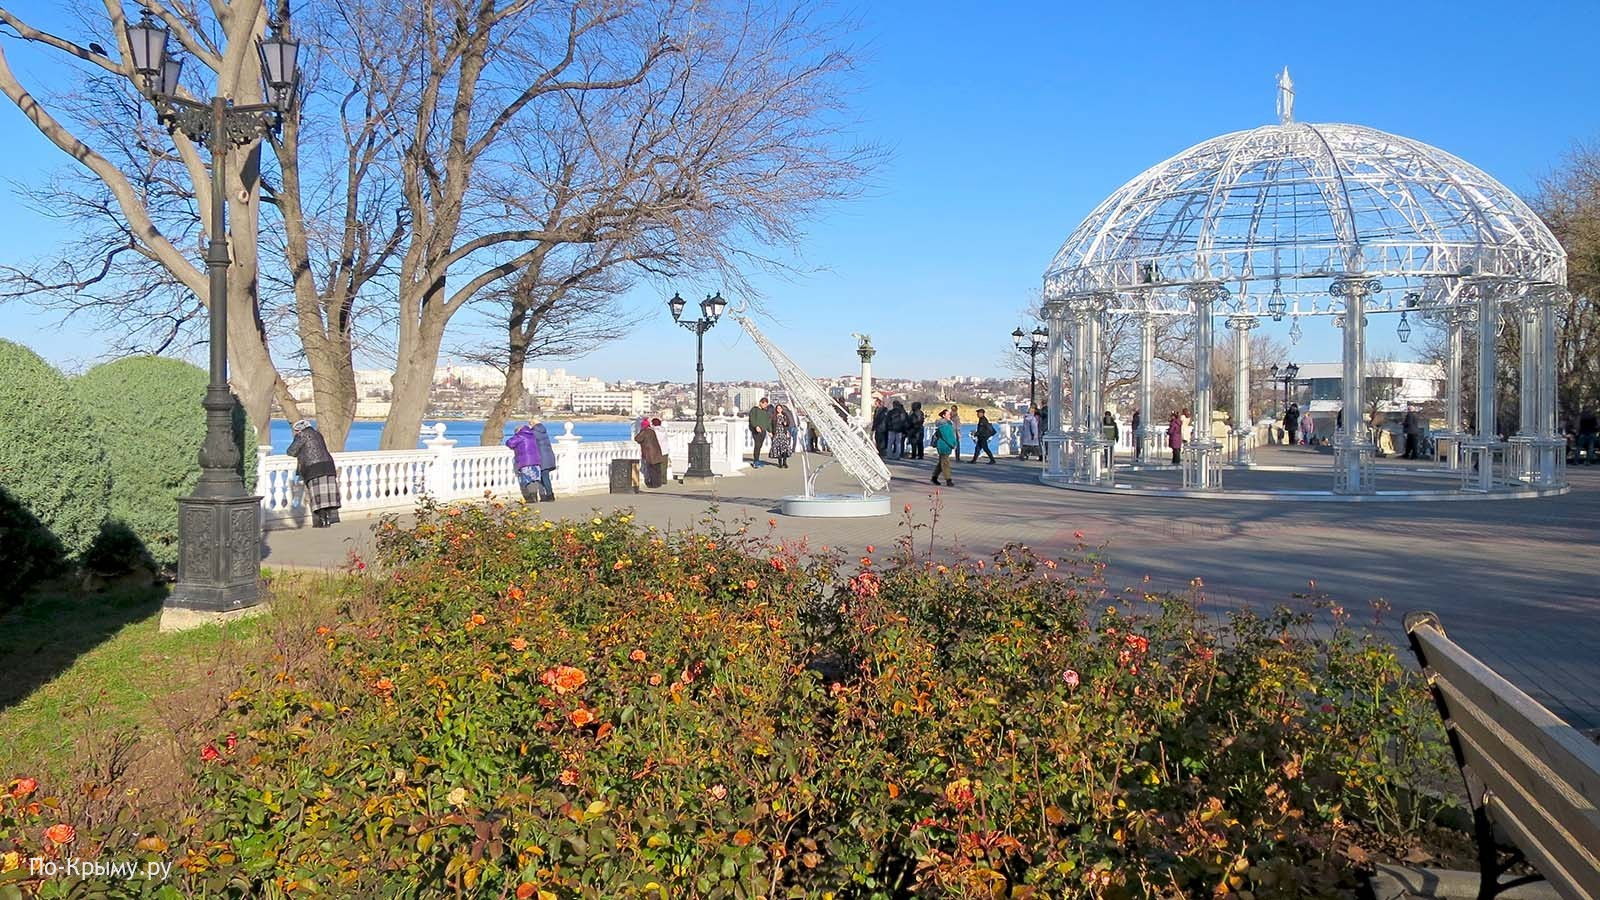 Севастополь, приморский бульвар, клумба с розами